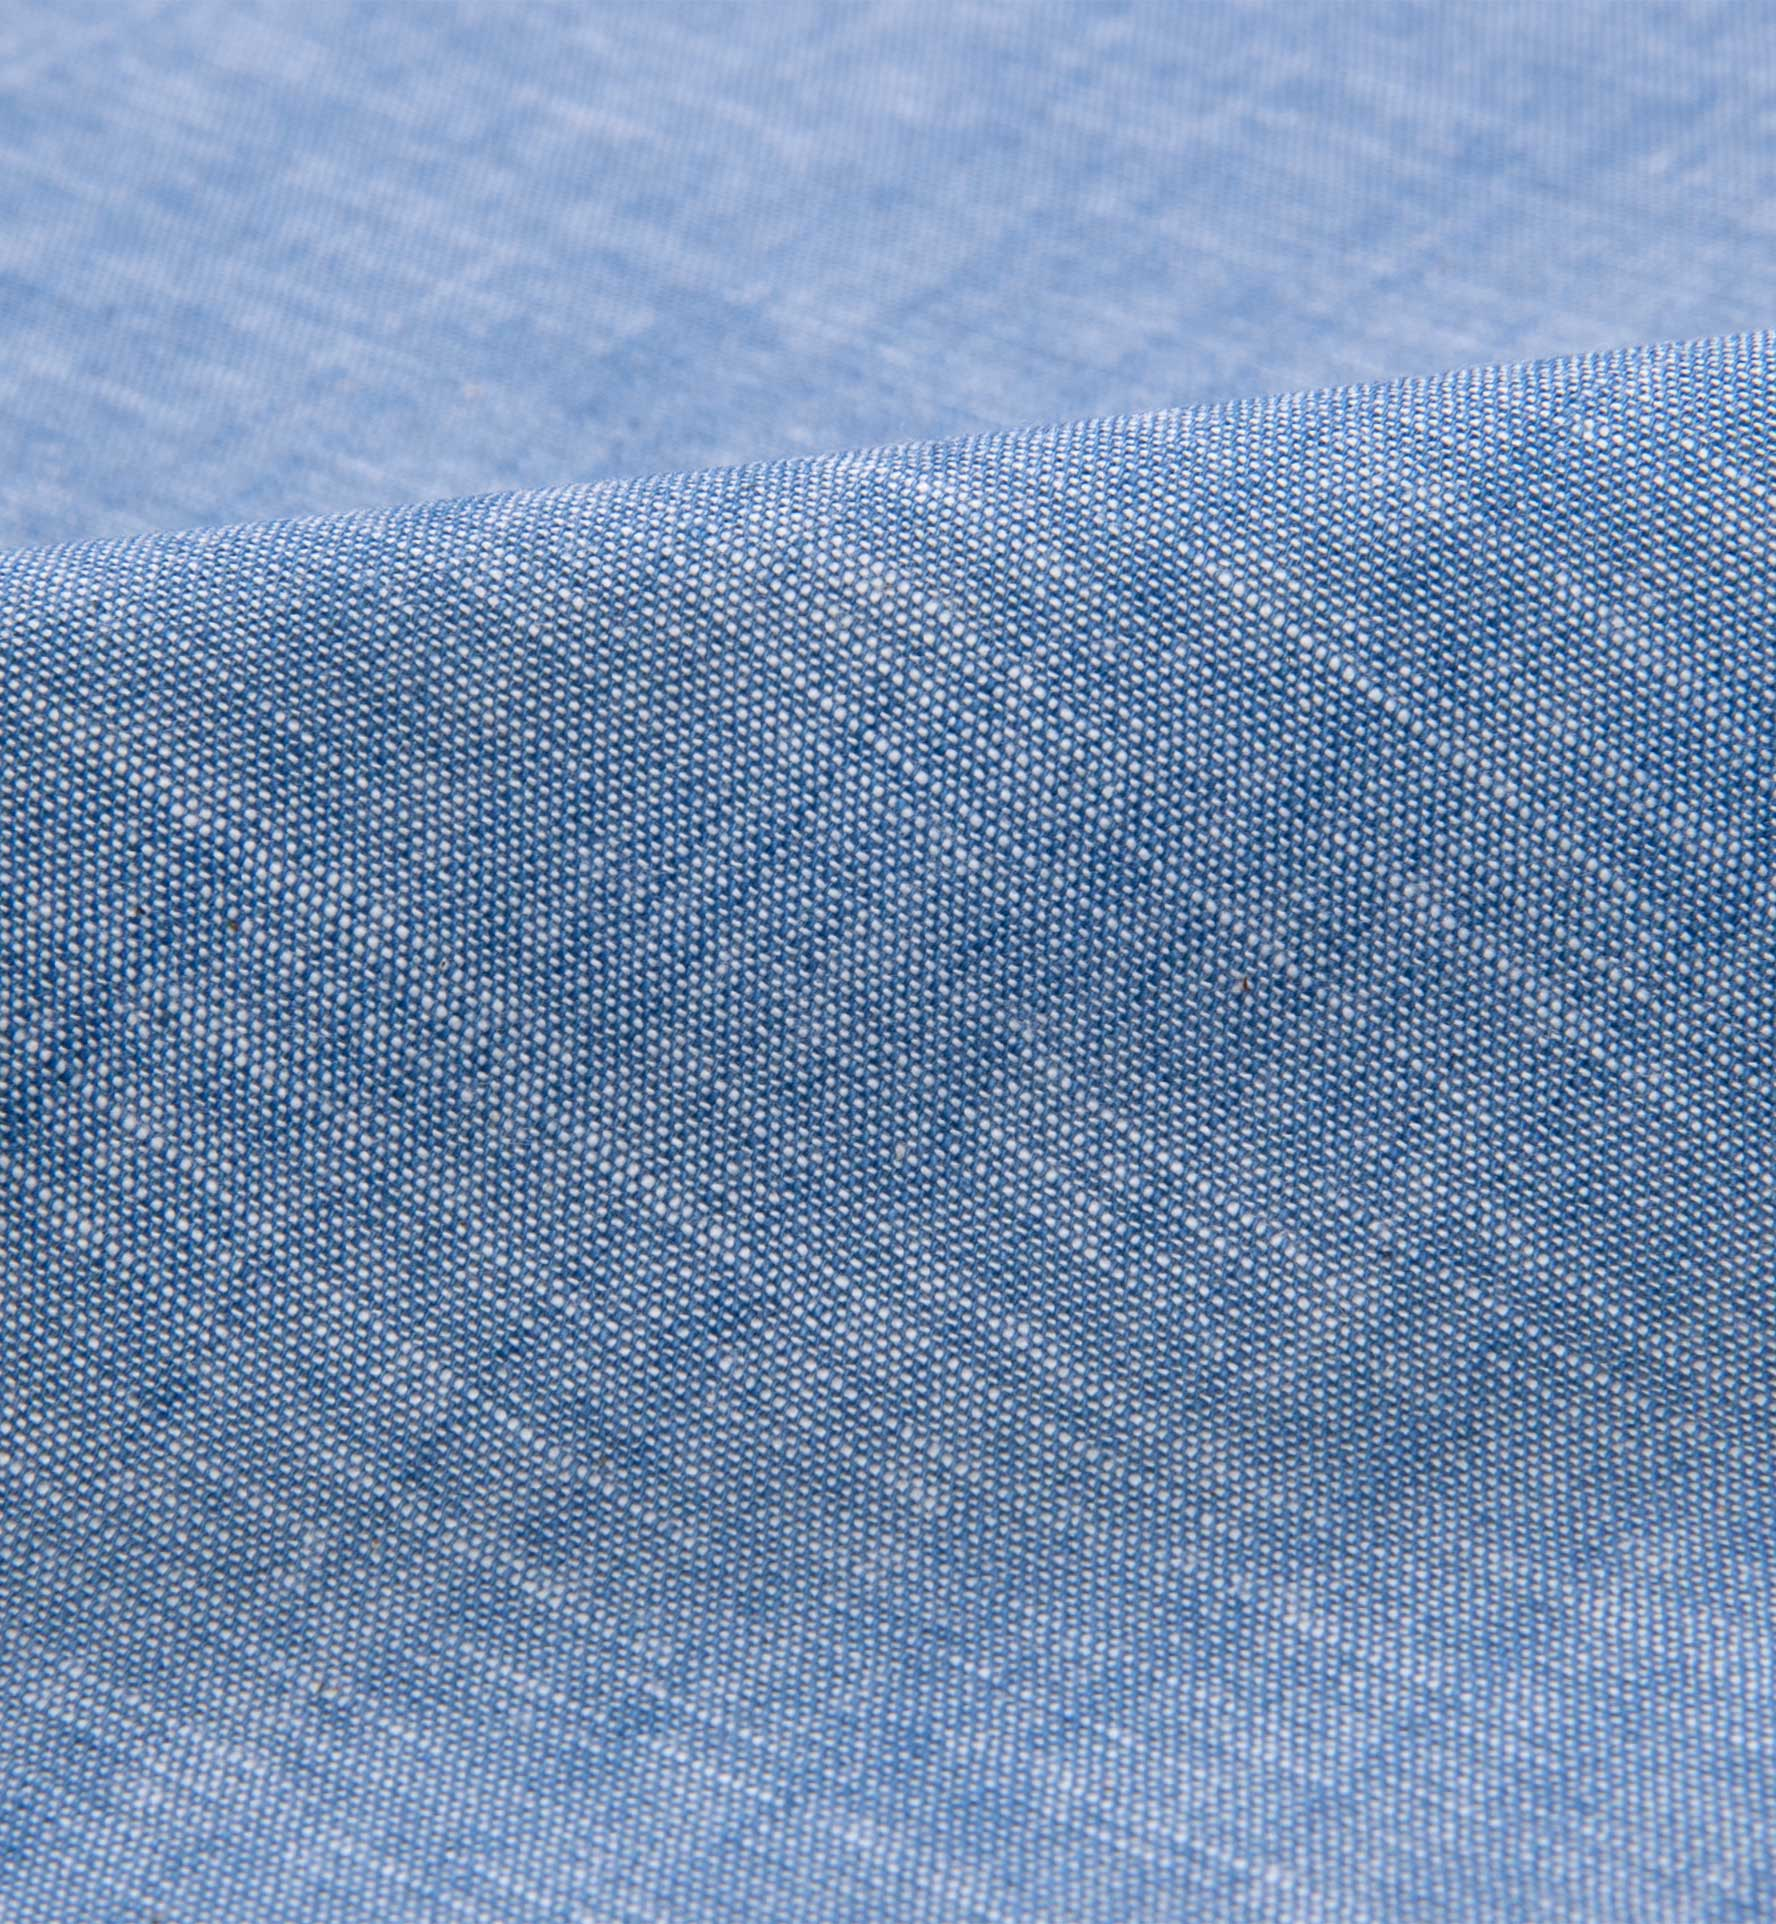 Japanese light indigo slub chambray shirts by proper cloth for Chambray fabric